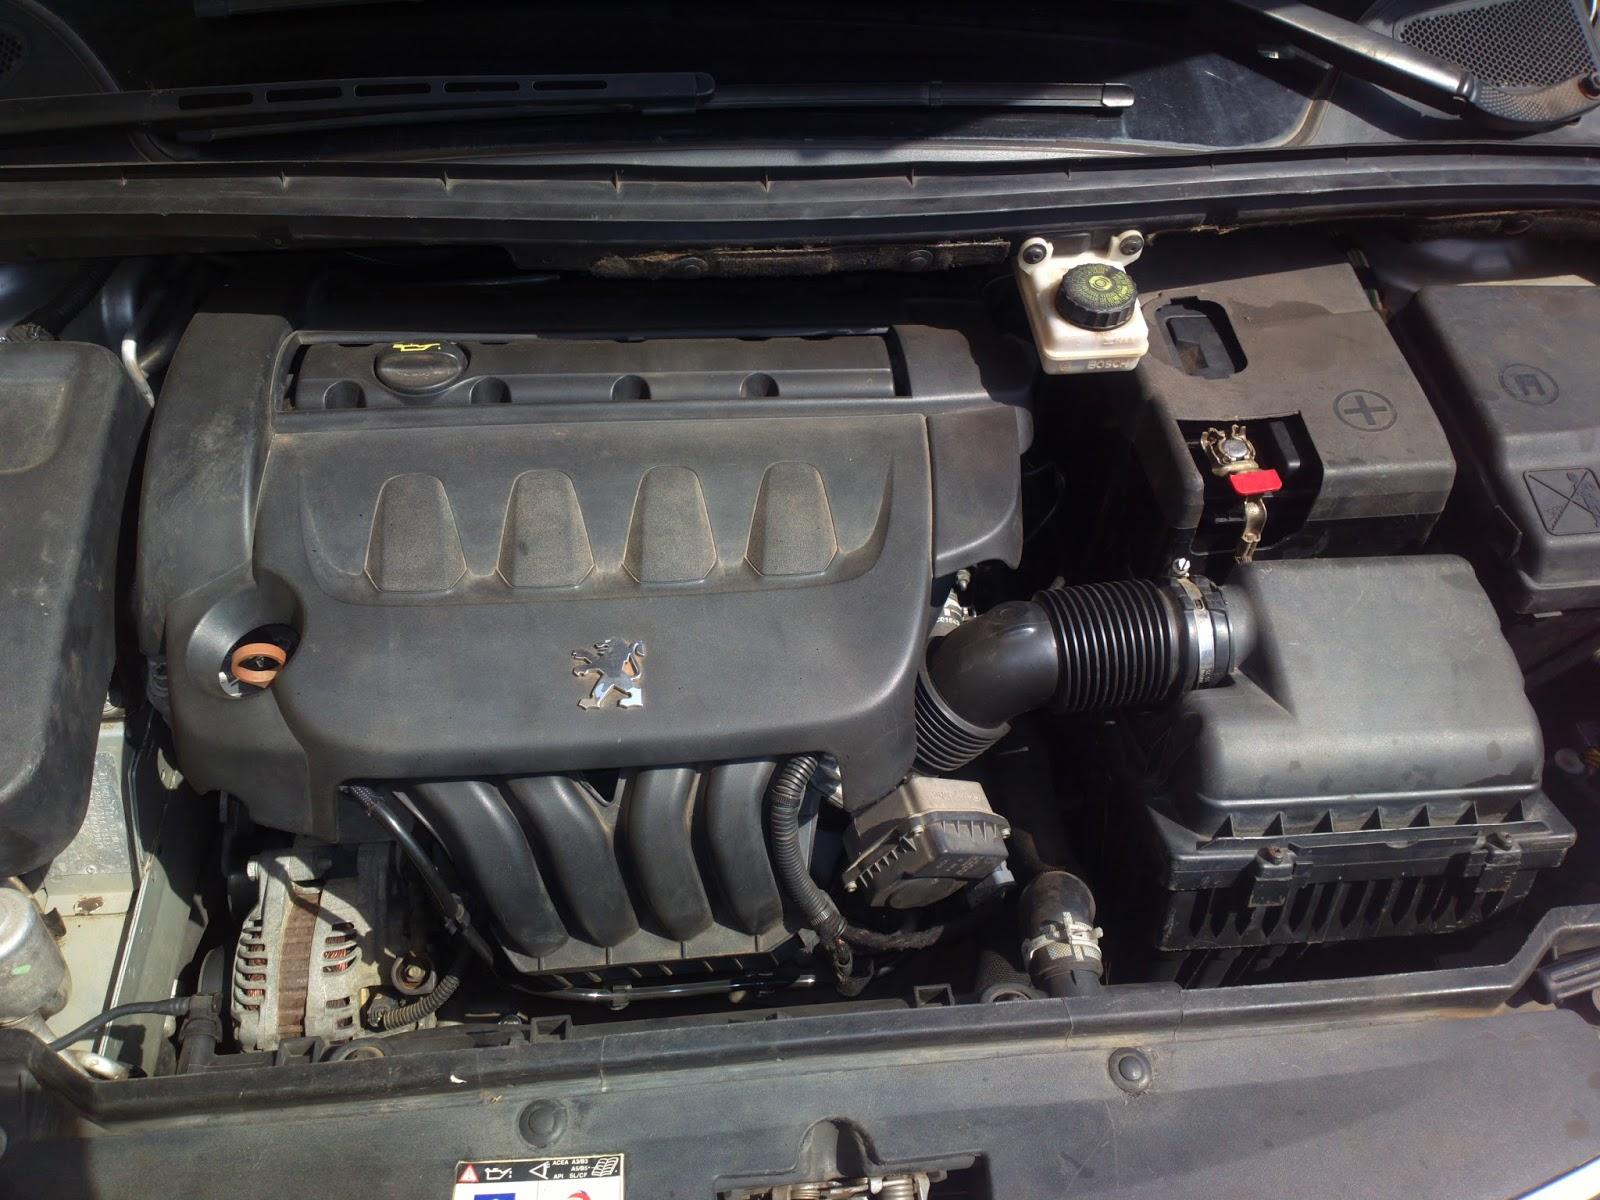 The Lion Community Blog Appreciation Of Psa Ew Engines Peugeot Timing Belt Ew10a